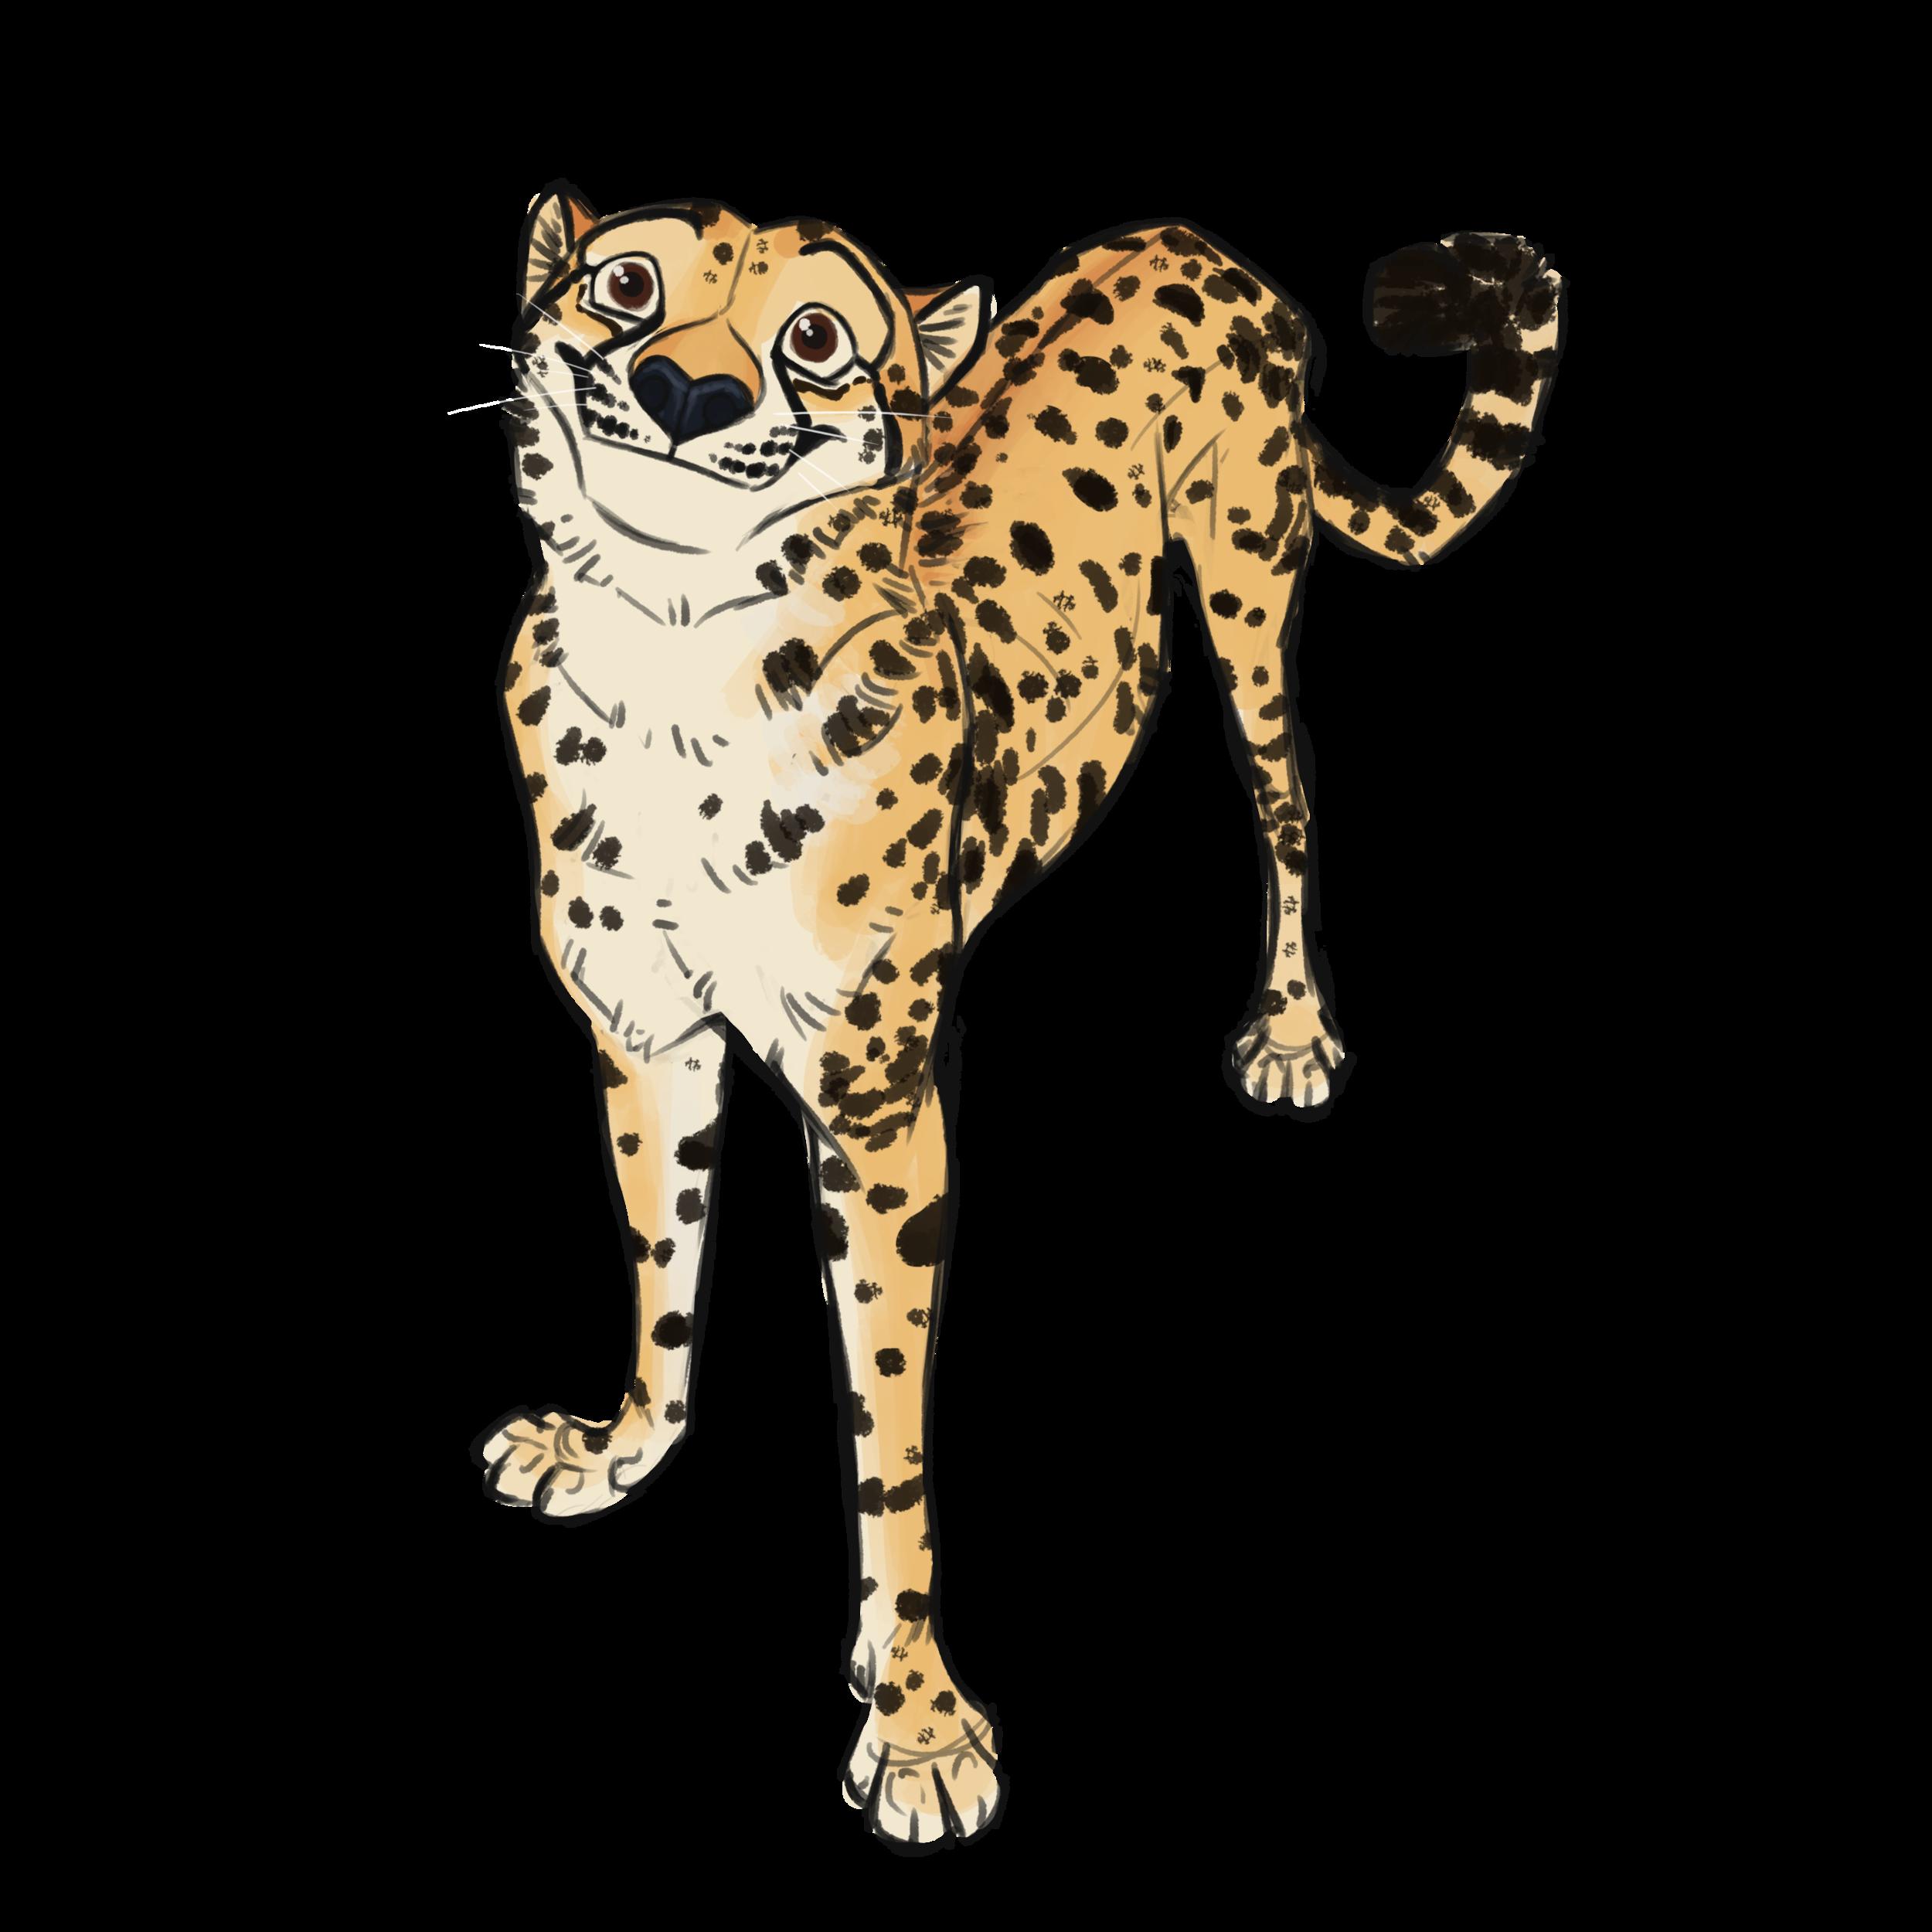 cheetah-tori-maier.png